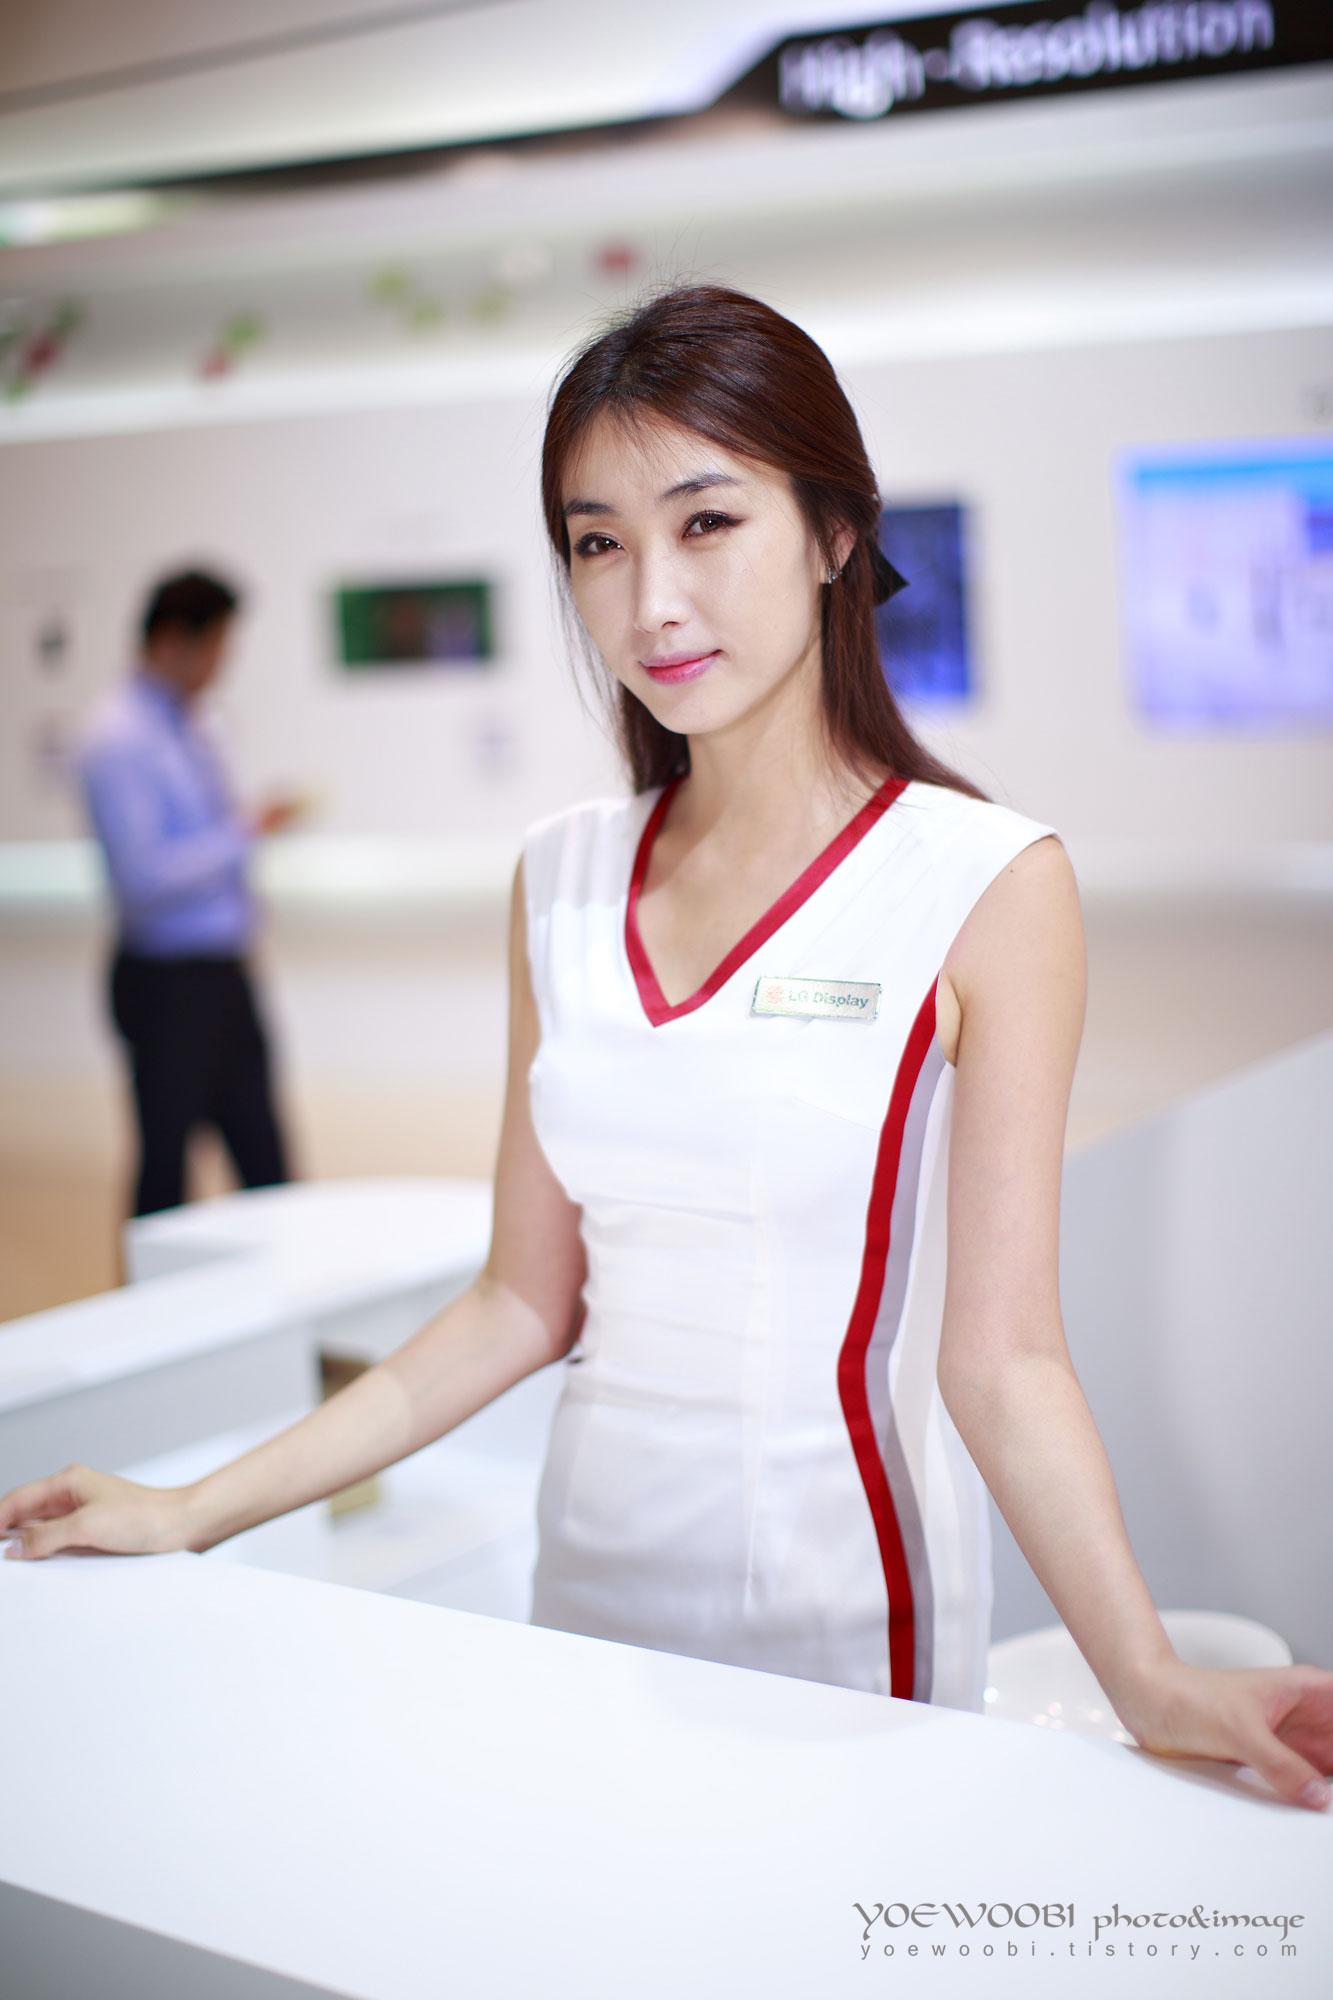 KES 2013 trade show model